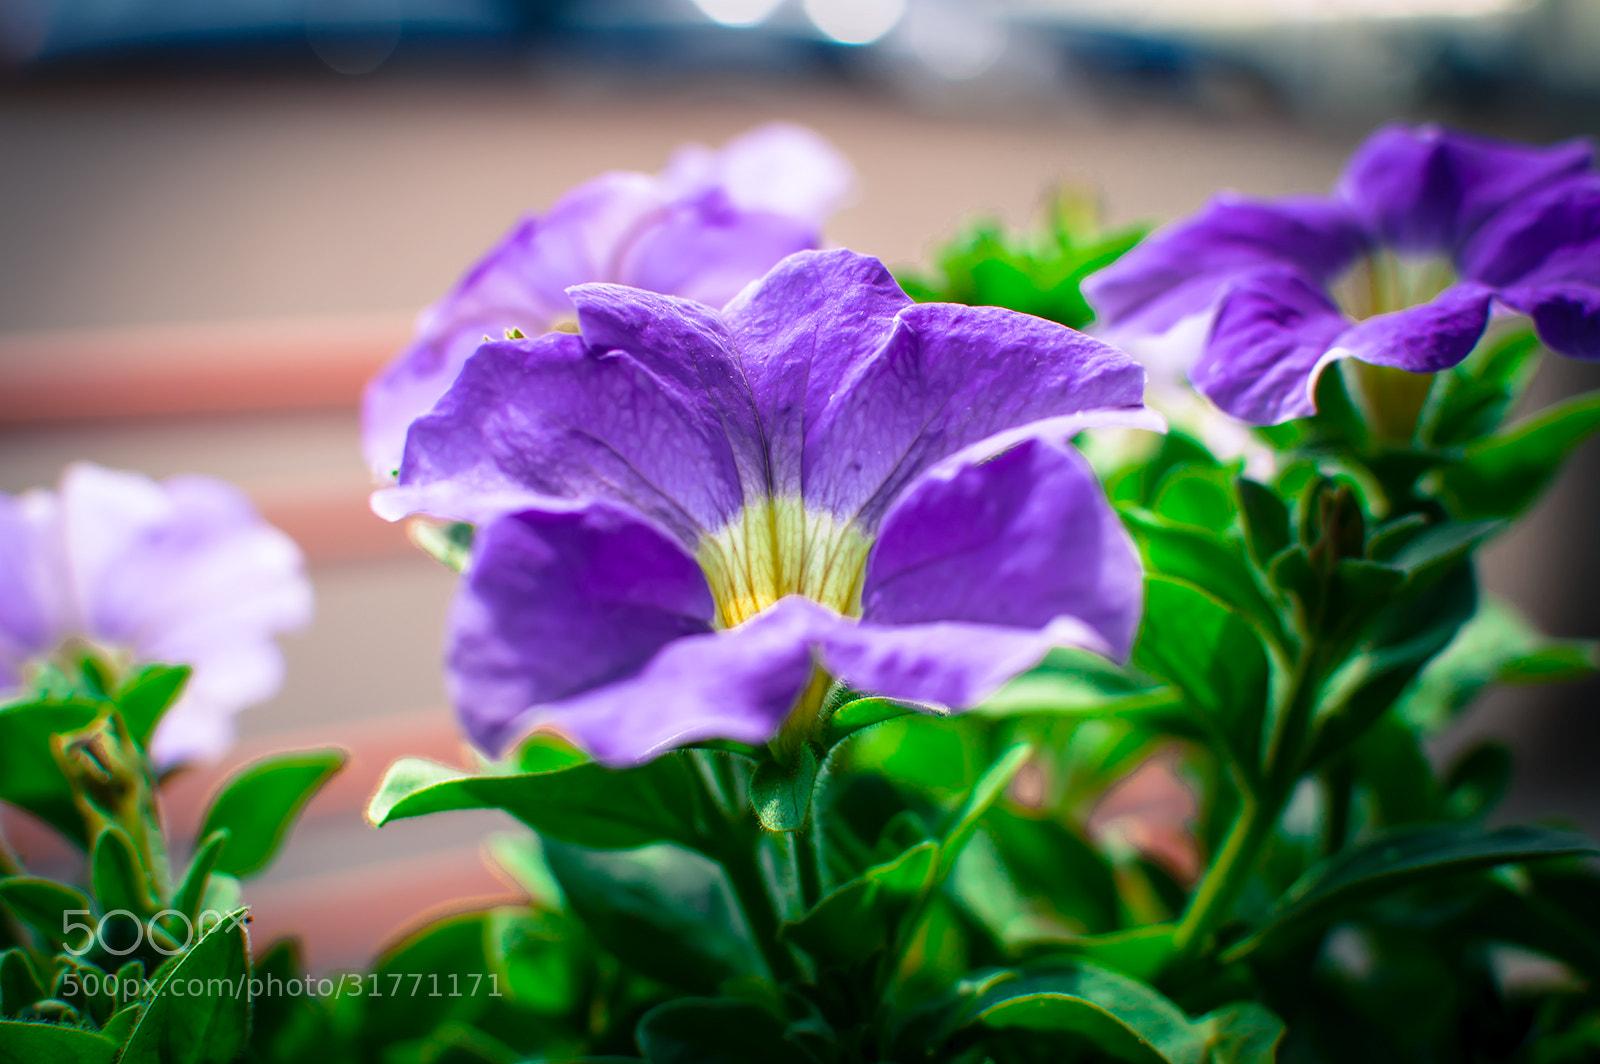 Photograph Purplec by Yane Naumoski on 500px